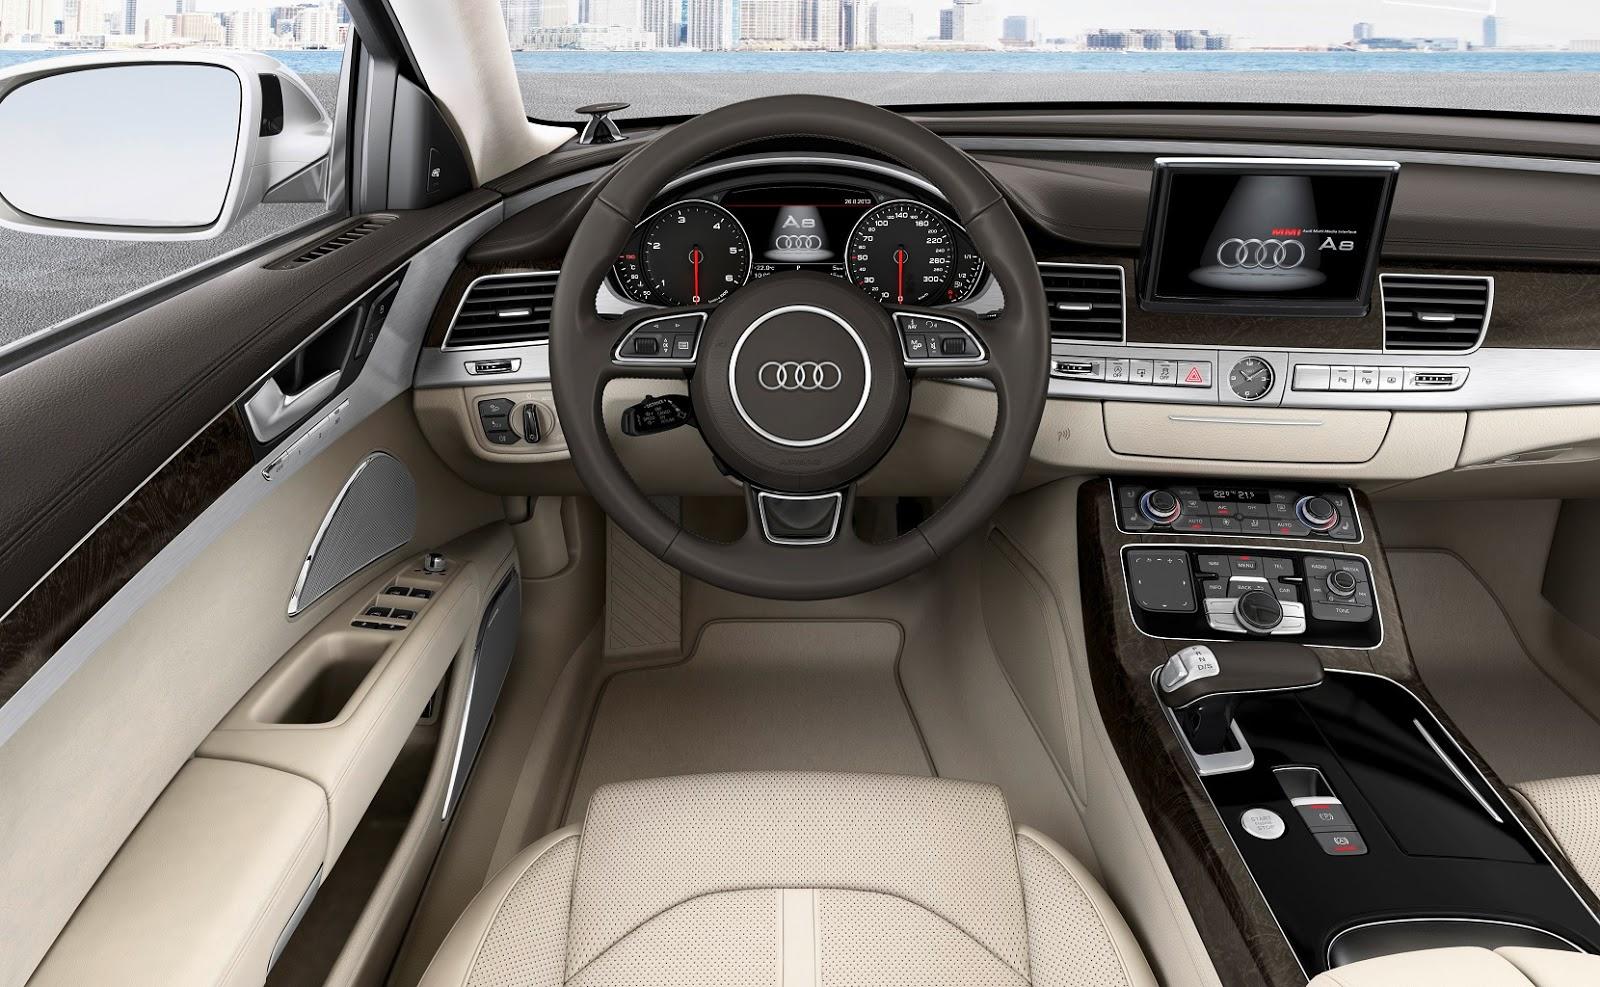 2014 Audi A8 TDI Interior